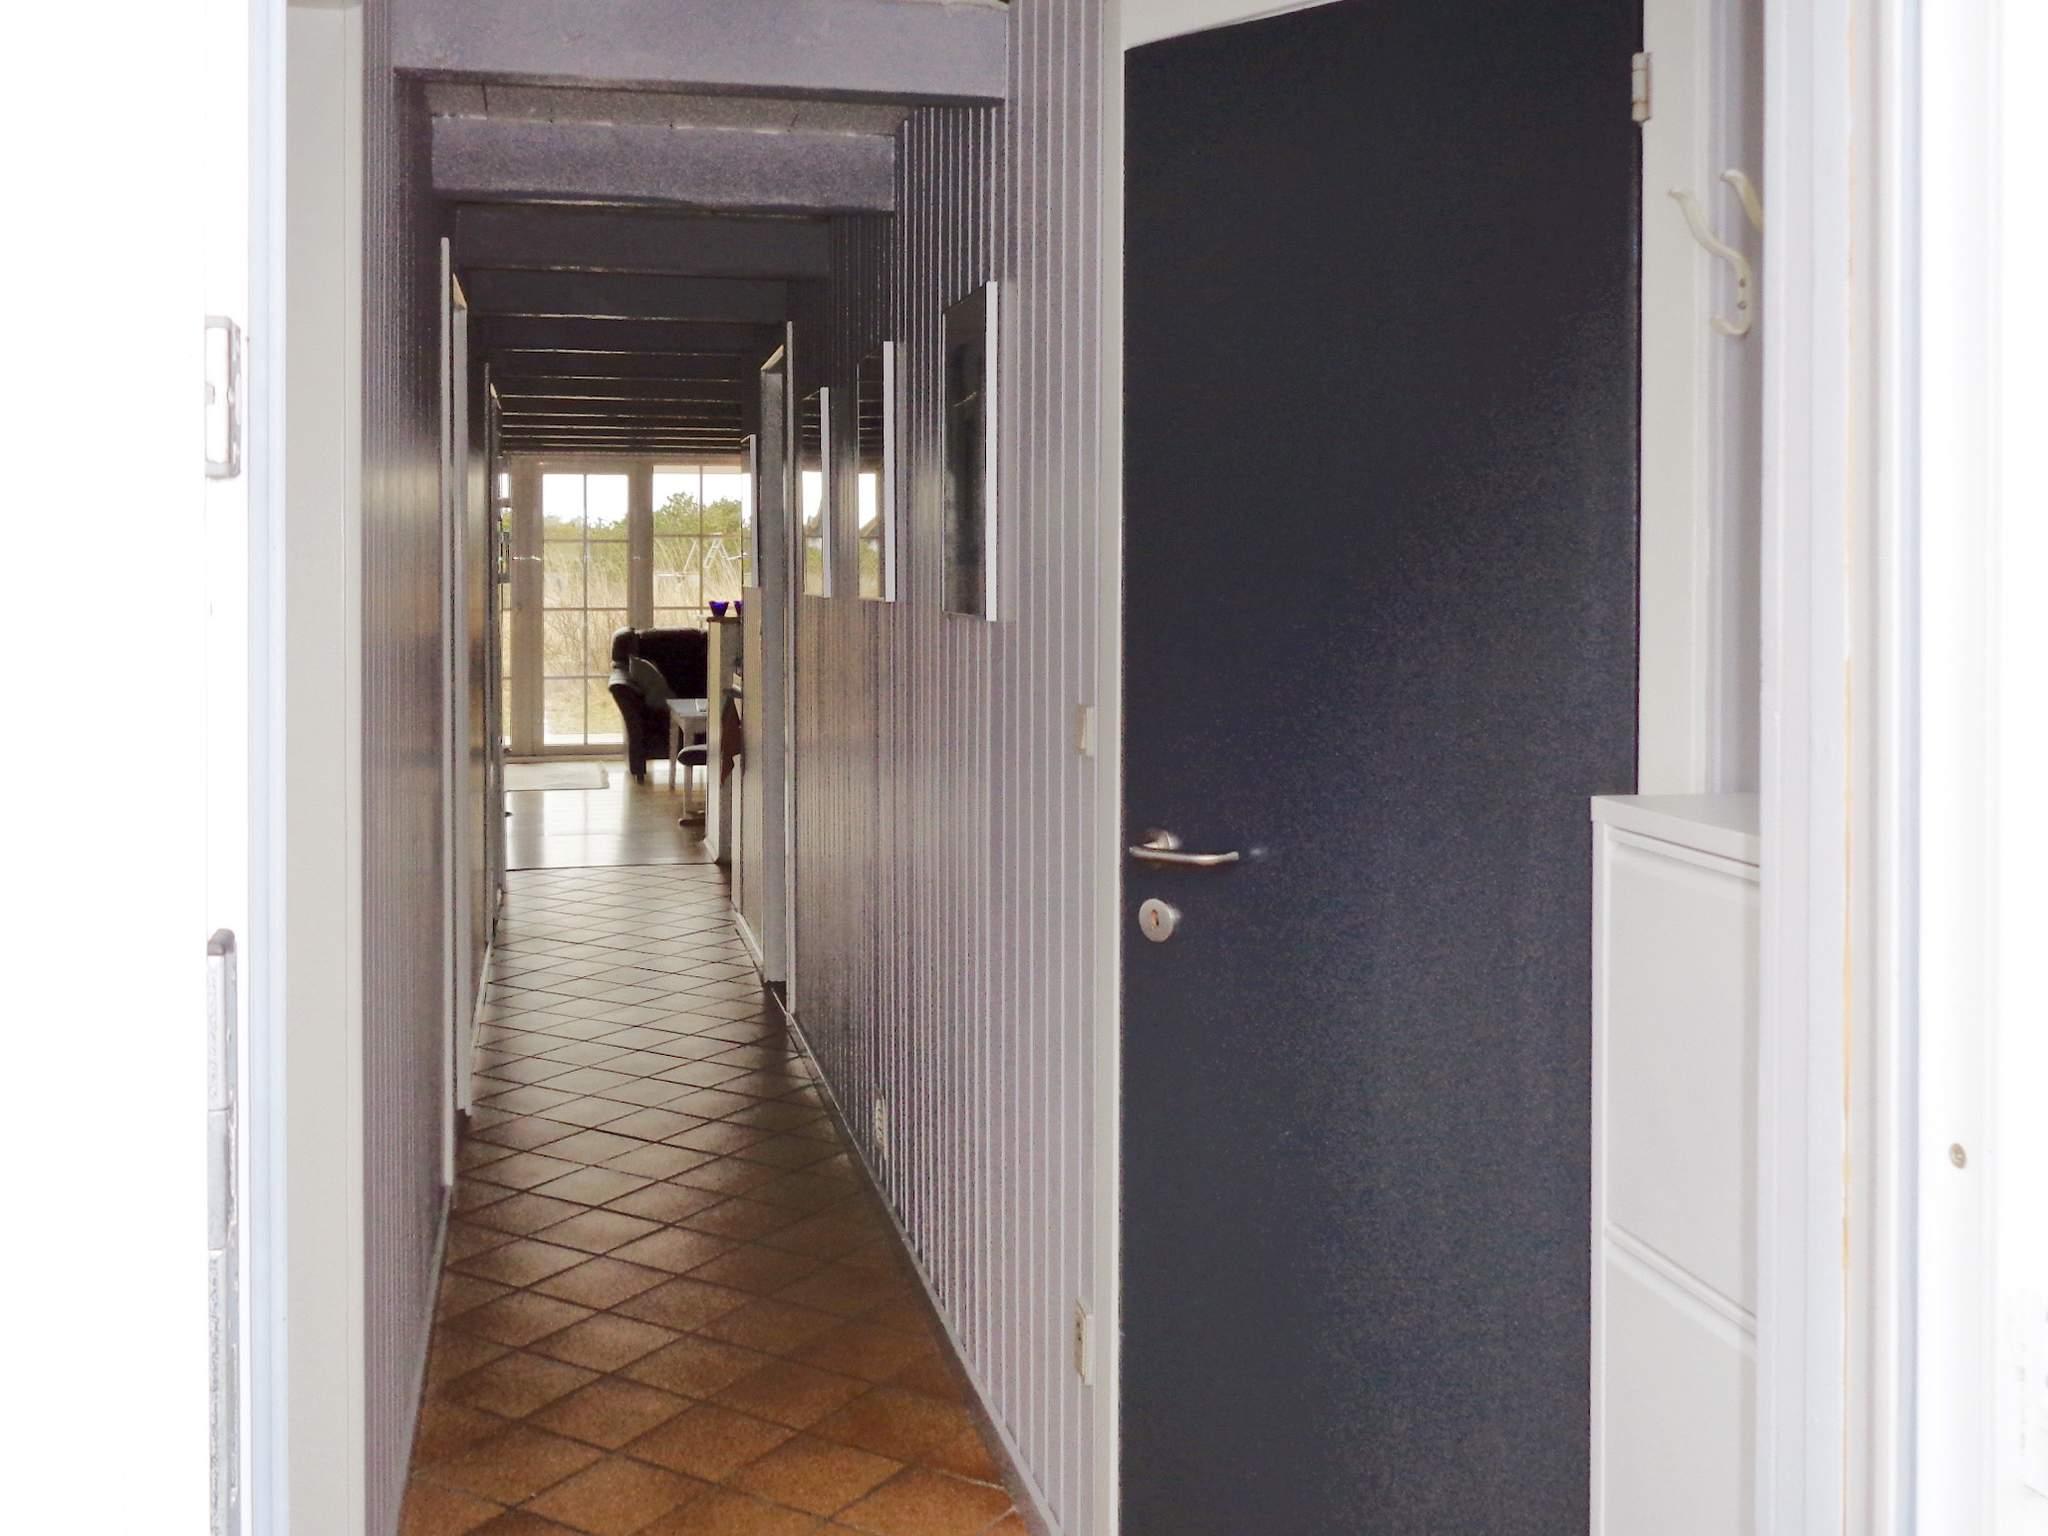 Ferienhaus Klegod (371178), Klegod, , Westjütland, Dänemark, Bild 12